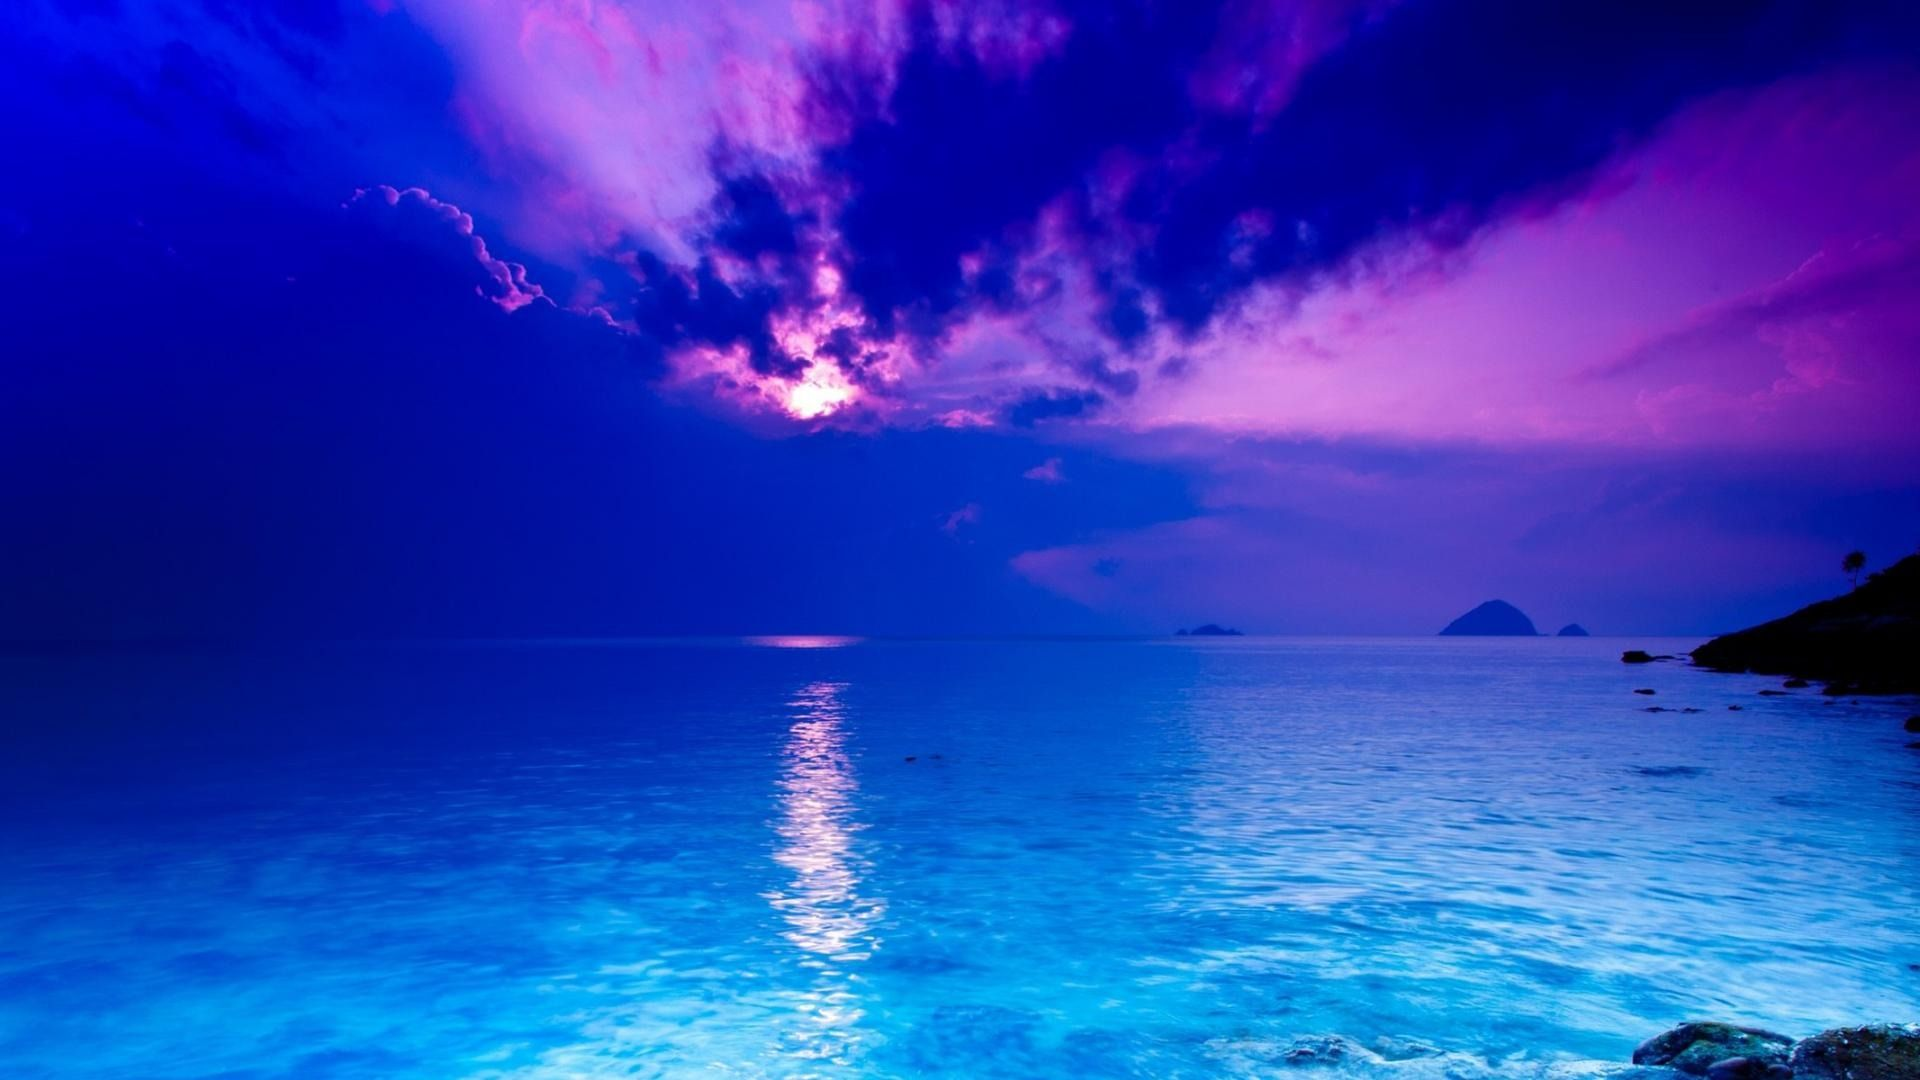 Screensaver Desktop Ocean Blue